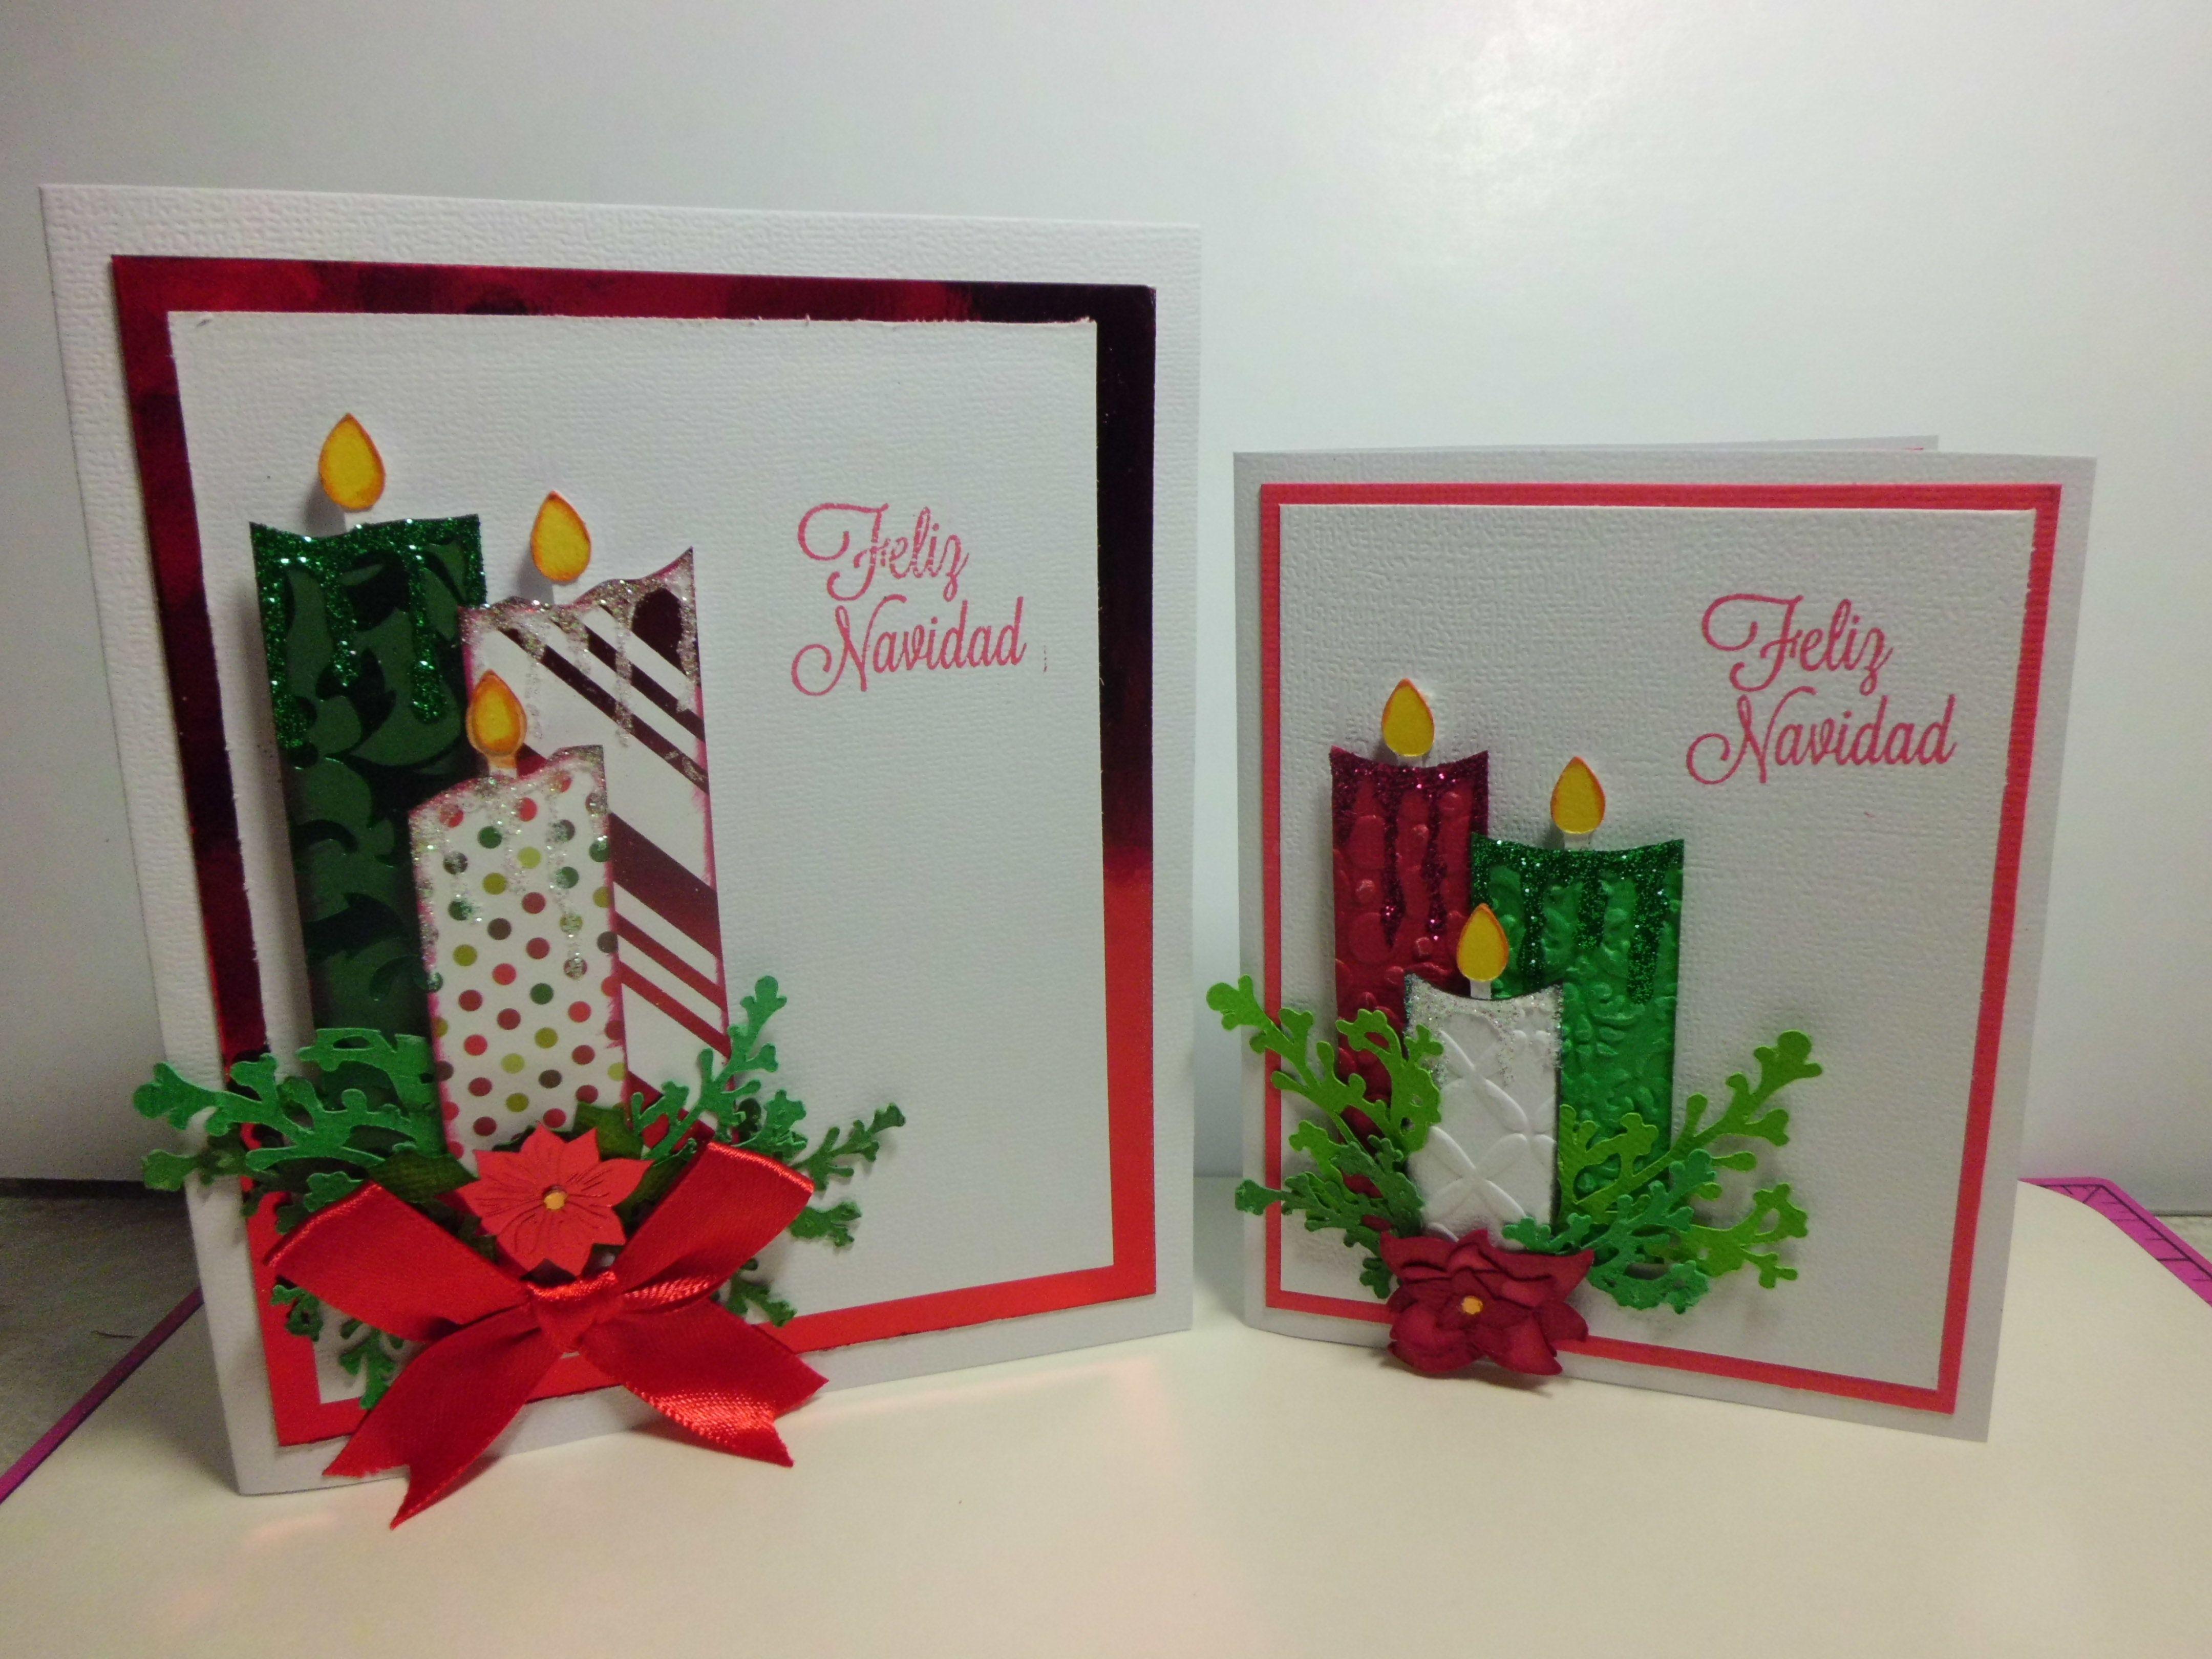 Tarjetas de navidad decoracion navidad pinterest - Hacer una tarjeta navidena ...